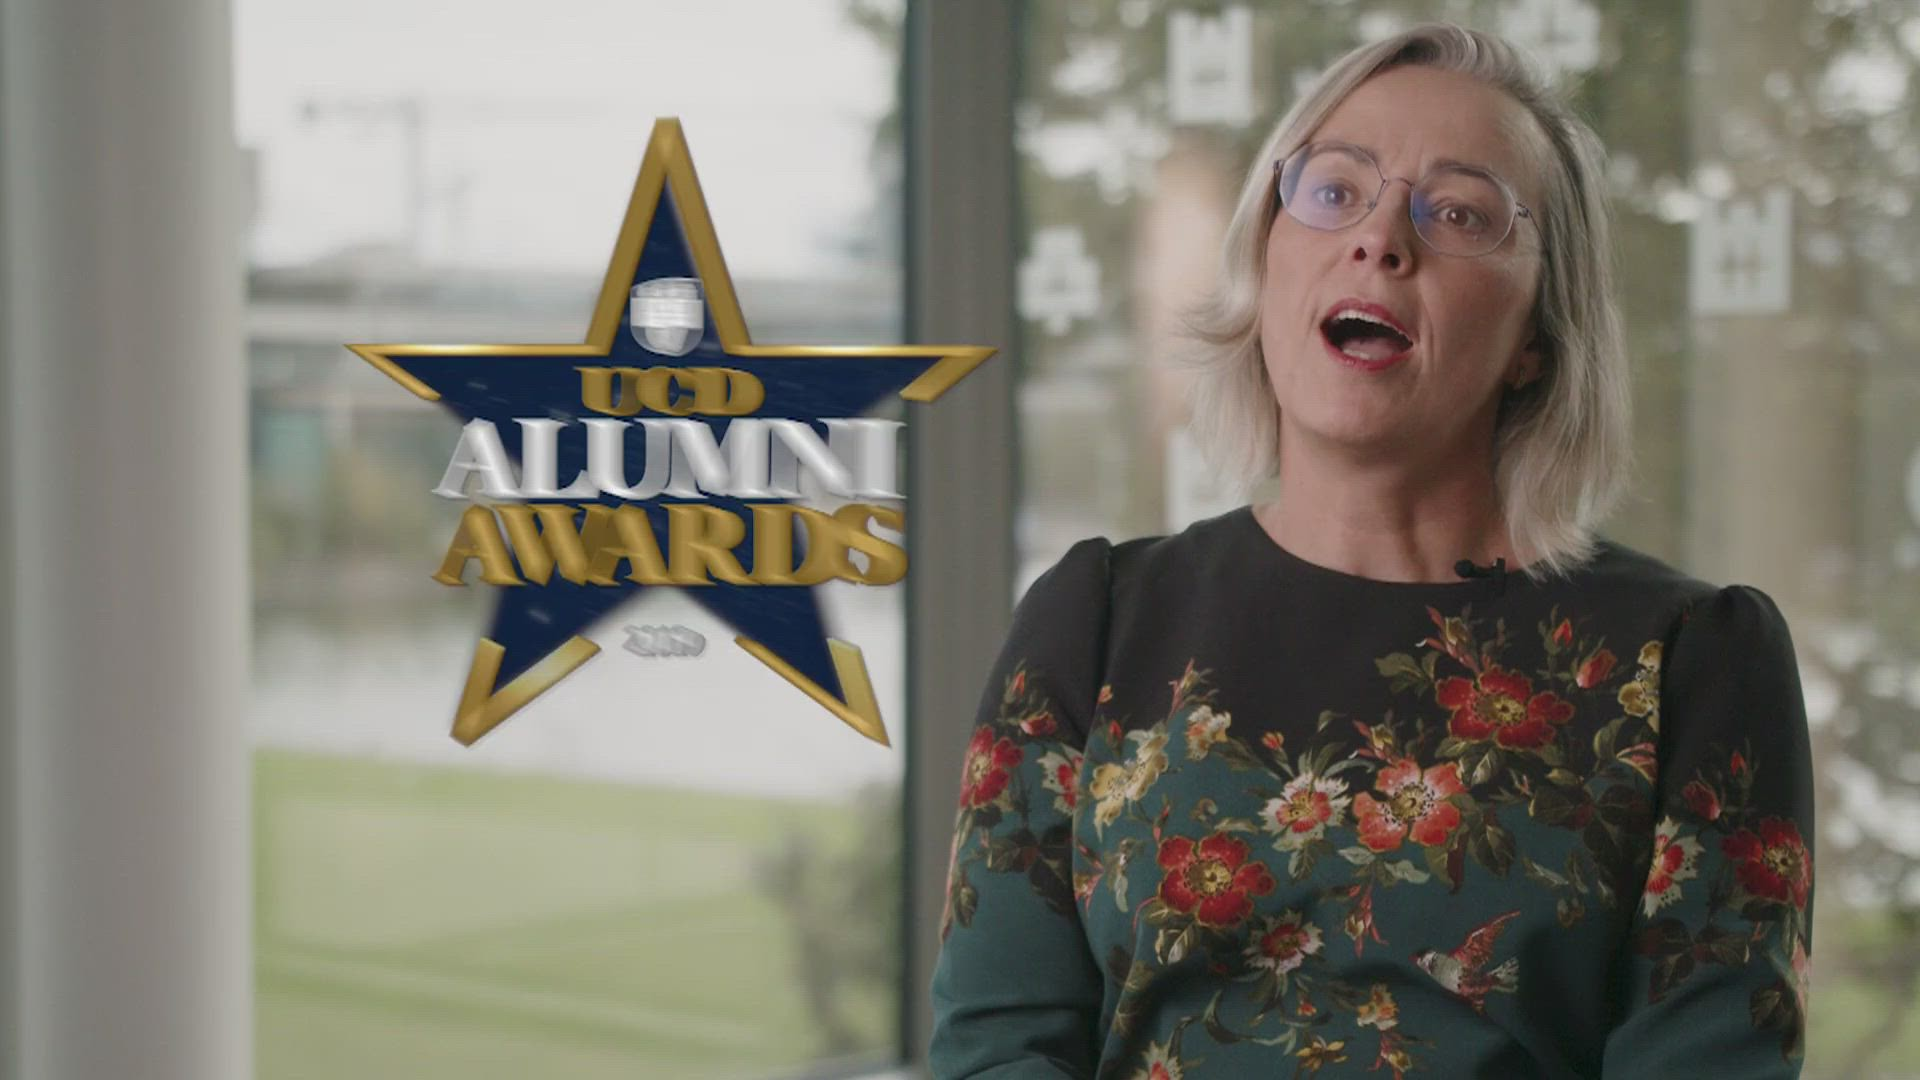 Colin Ryan 2019 Alumni Award Winner in Law